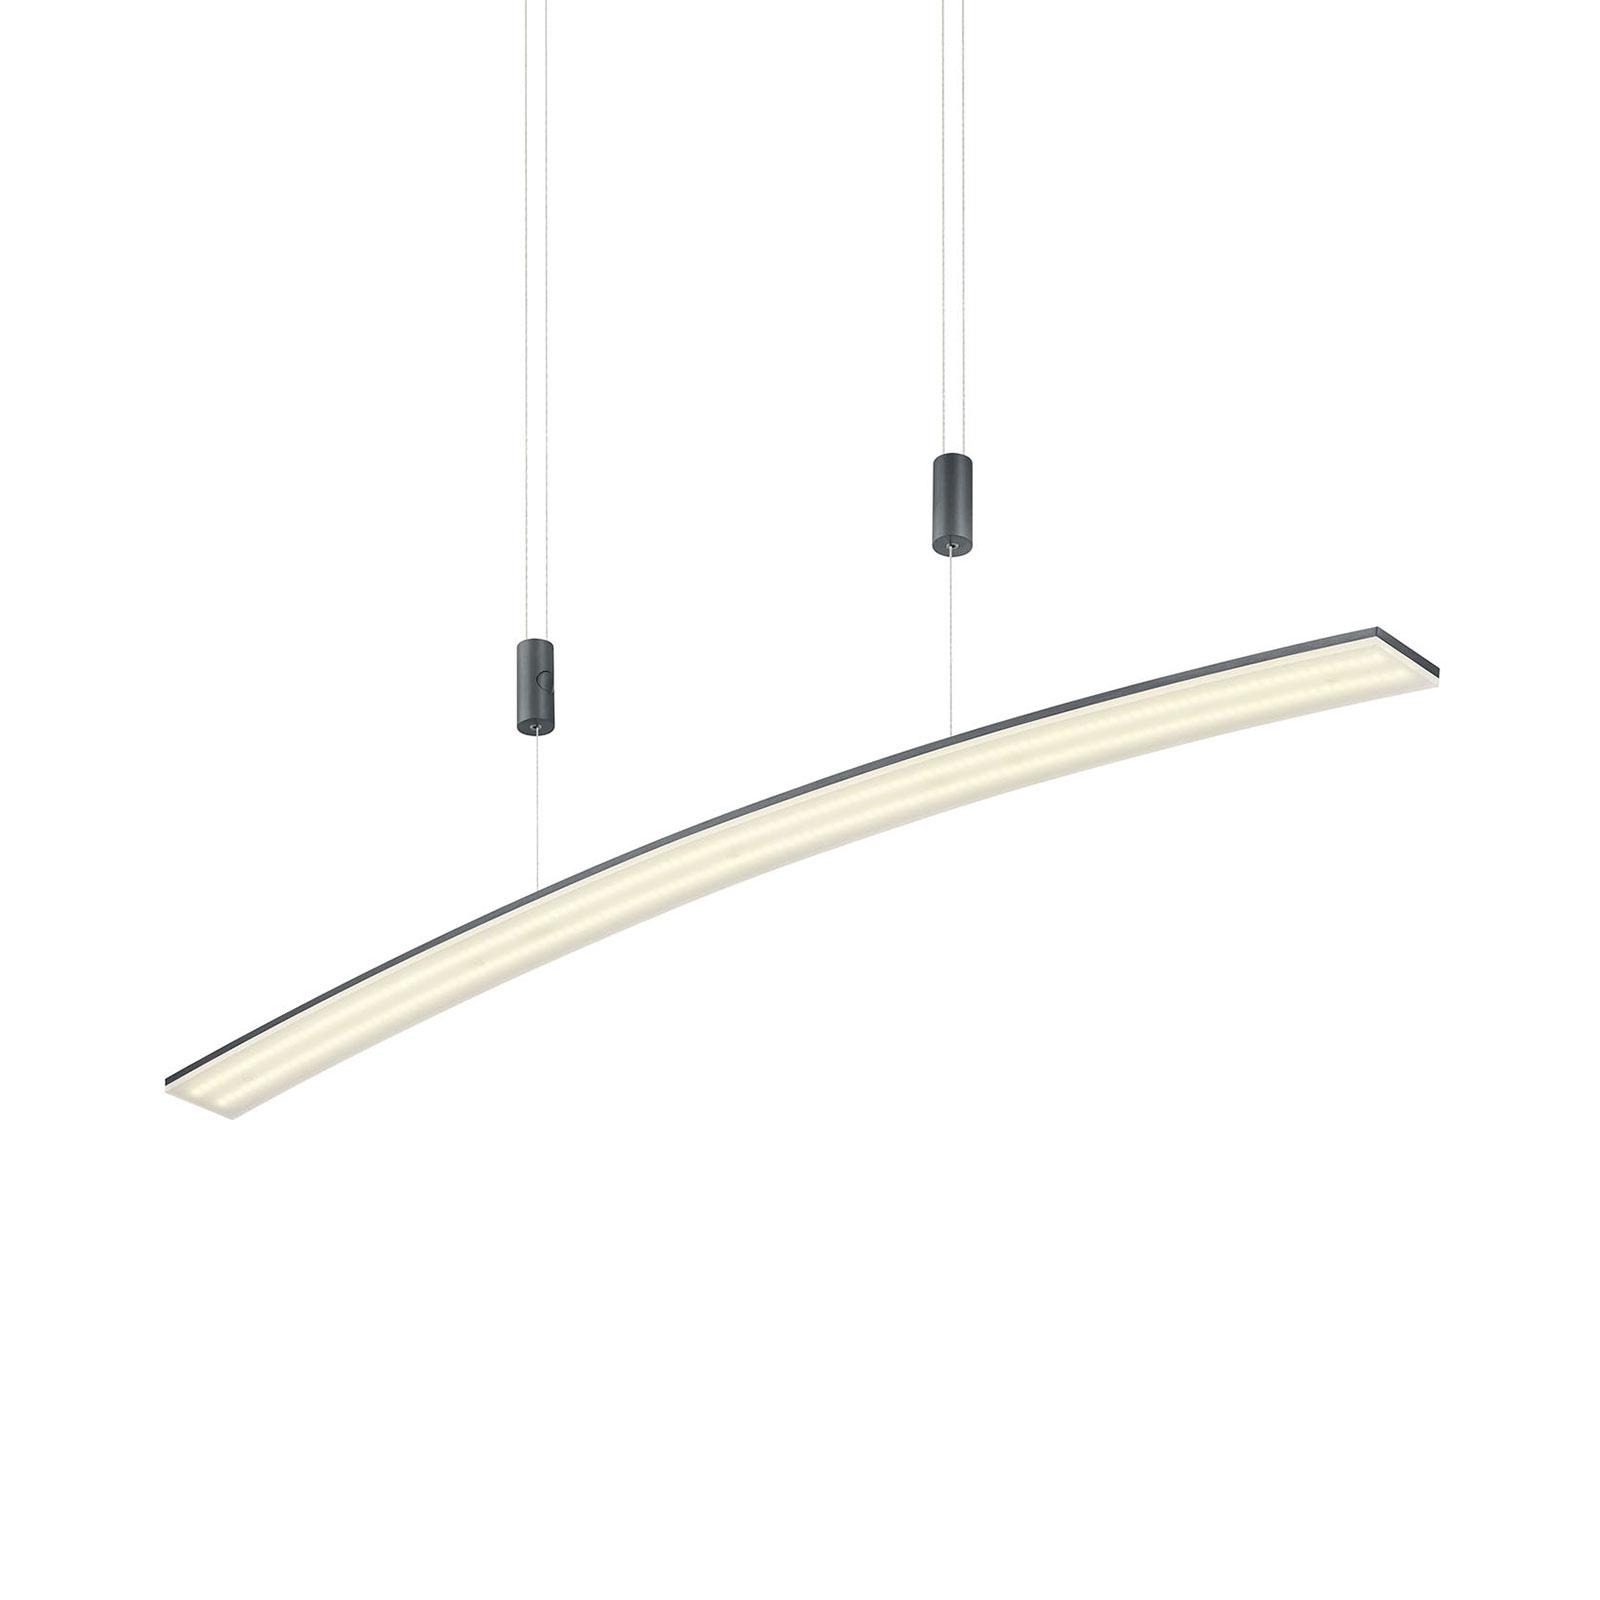 B-Leuchten New Loire lampa wisząca LED antracytowa